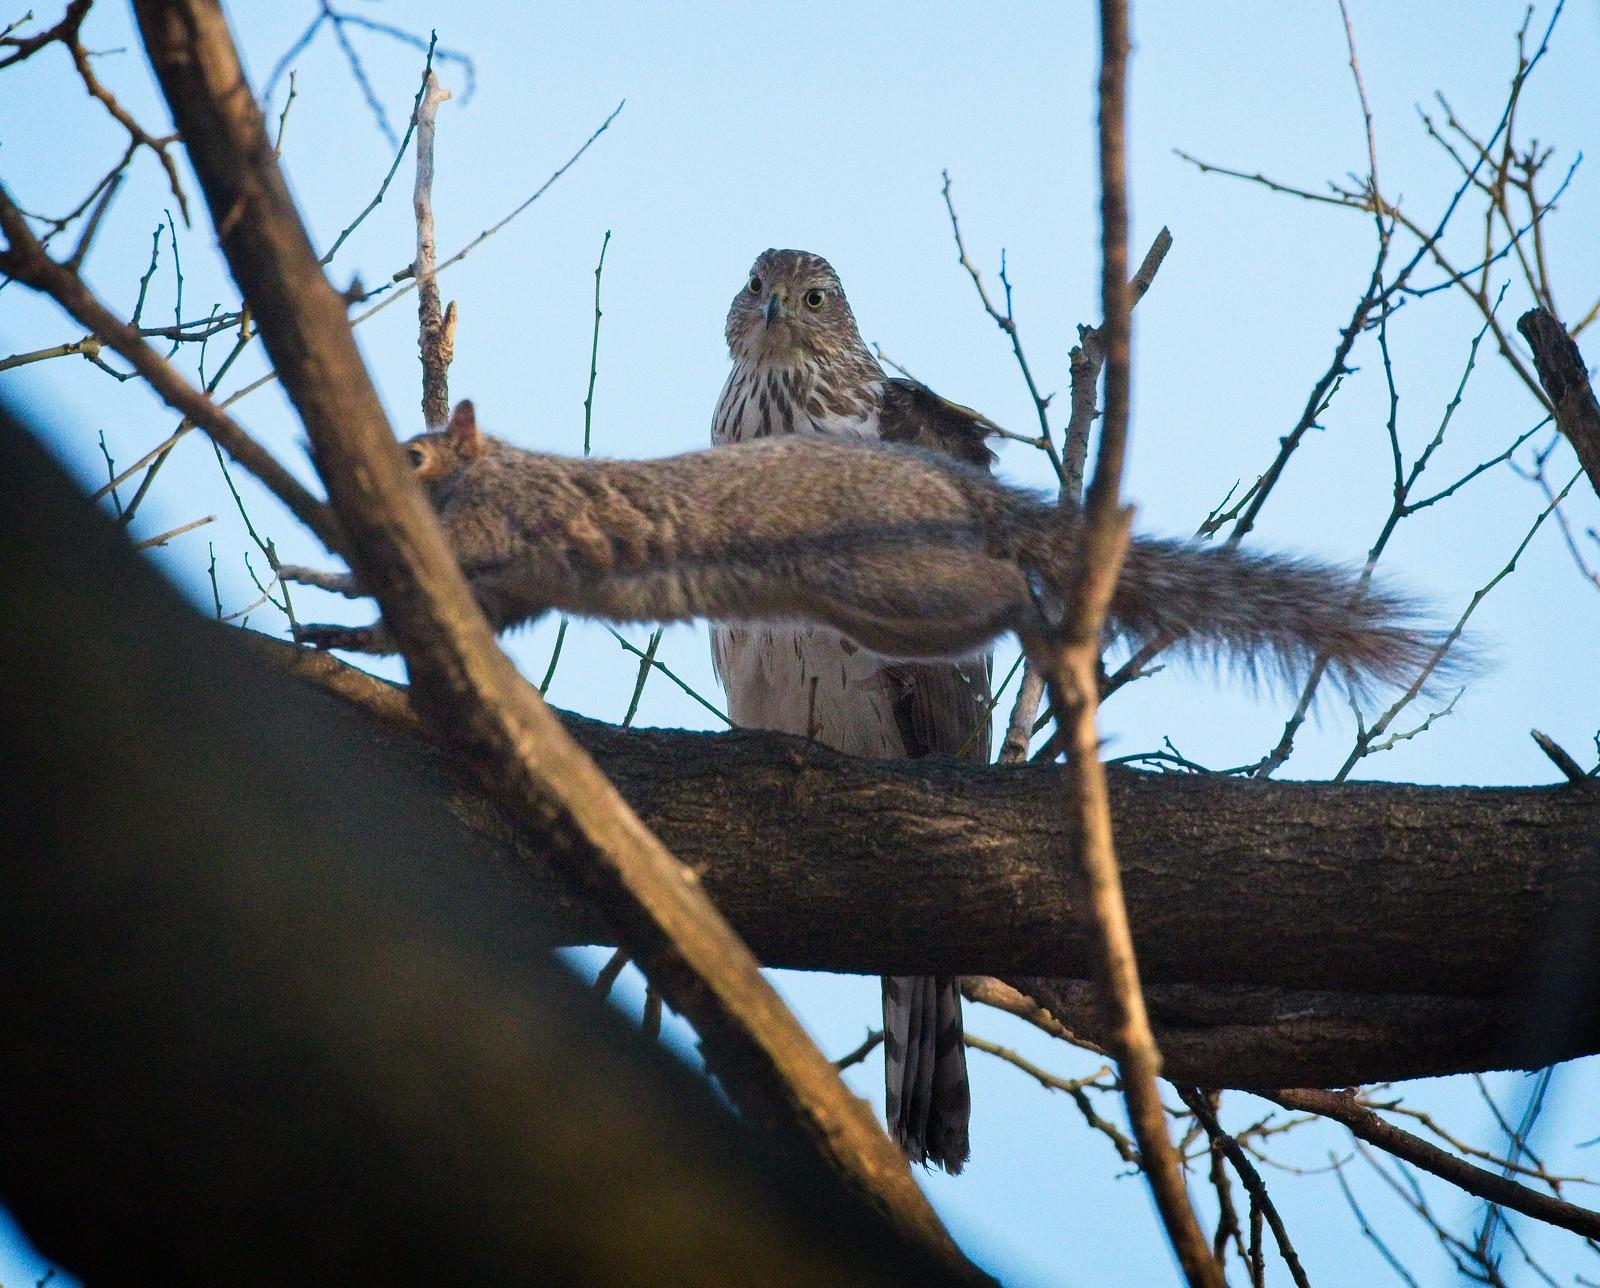 Cooper's hawk and a squirrel